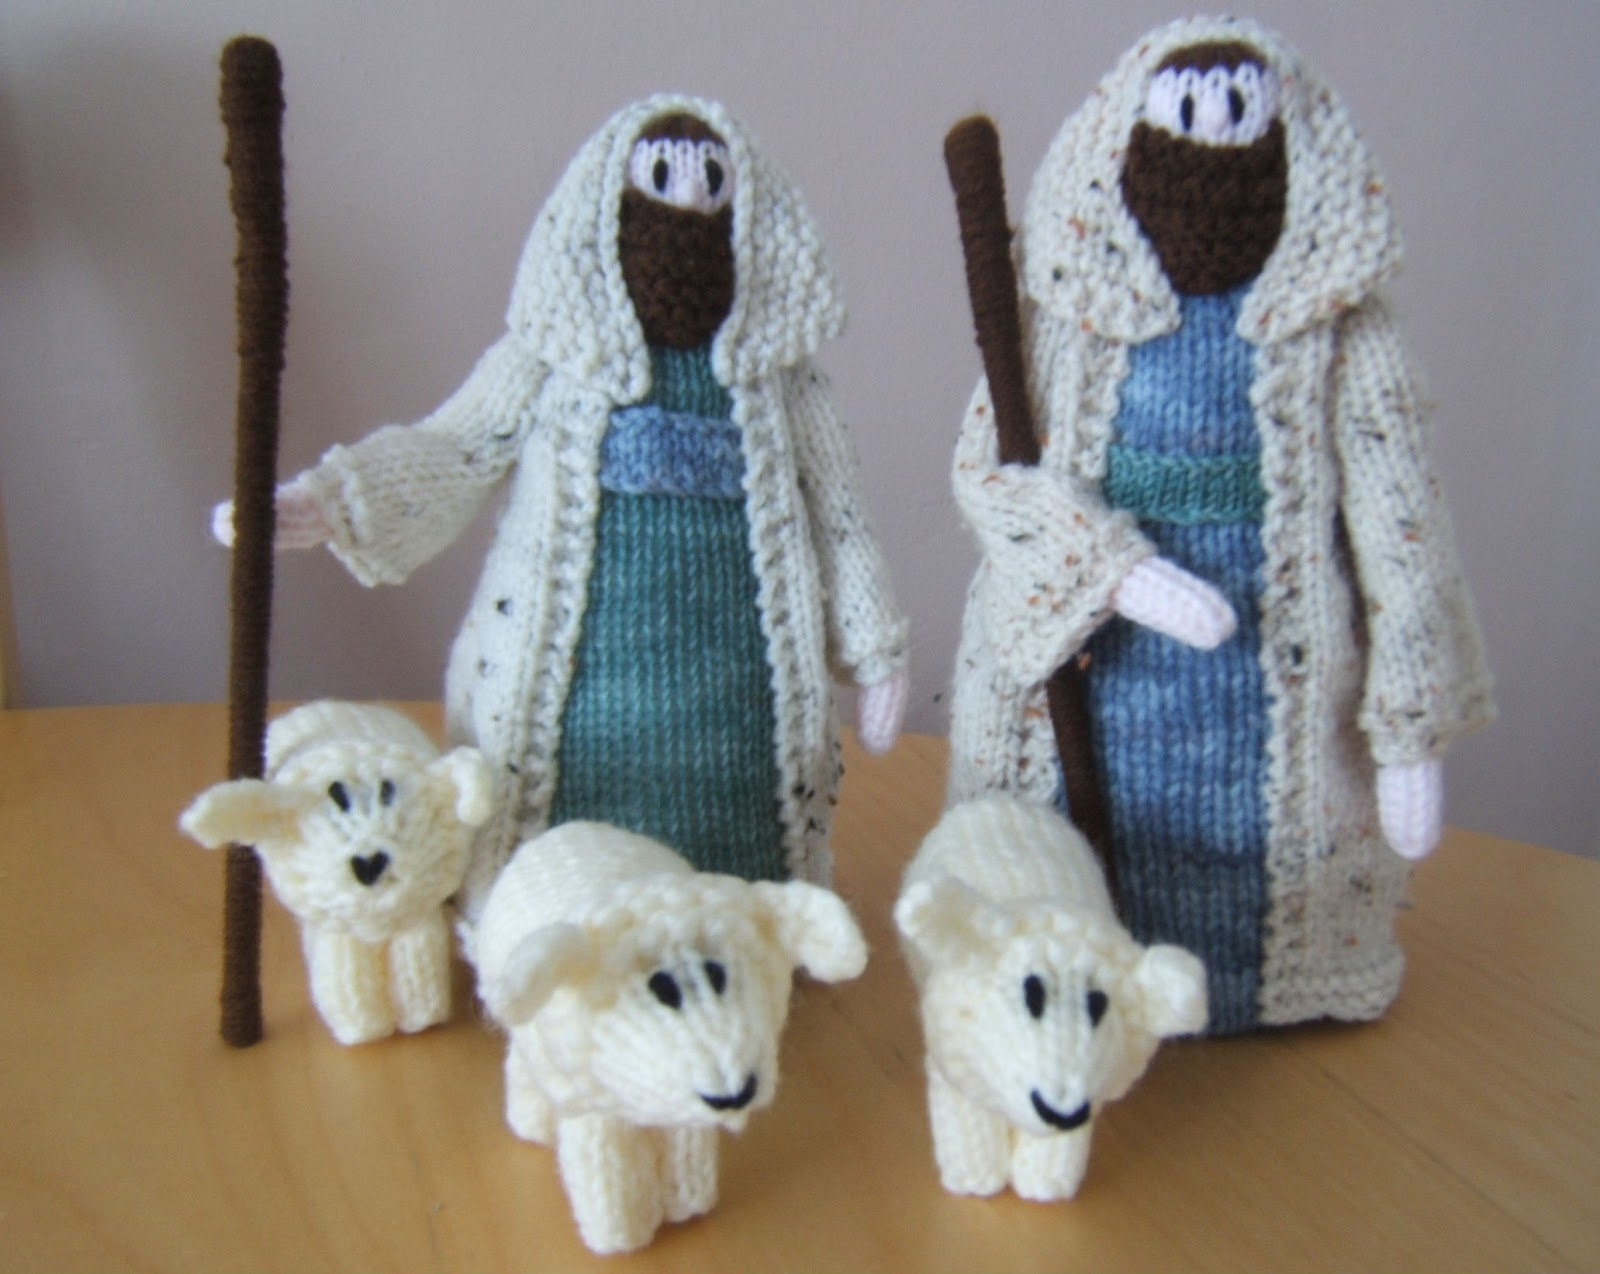 Shepherd Knitting Patterns Free : A little bit of everything: September 2012